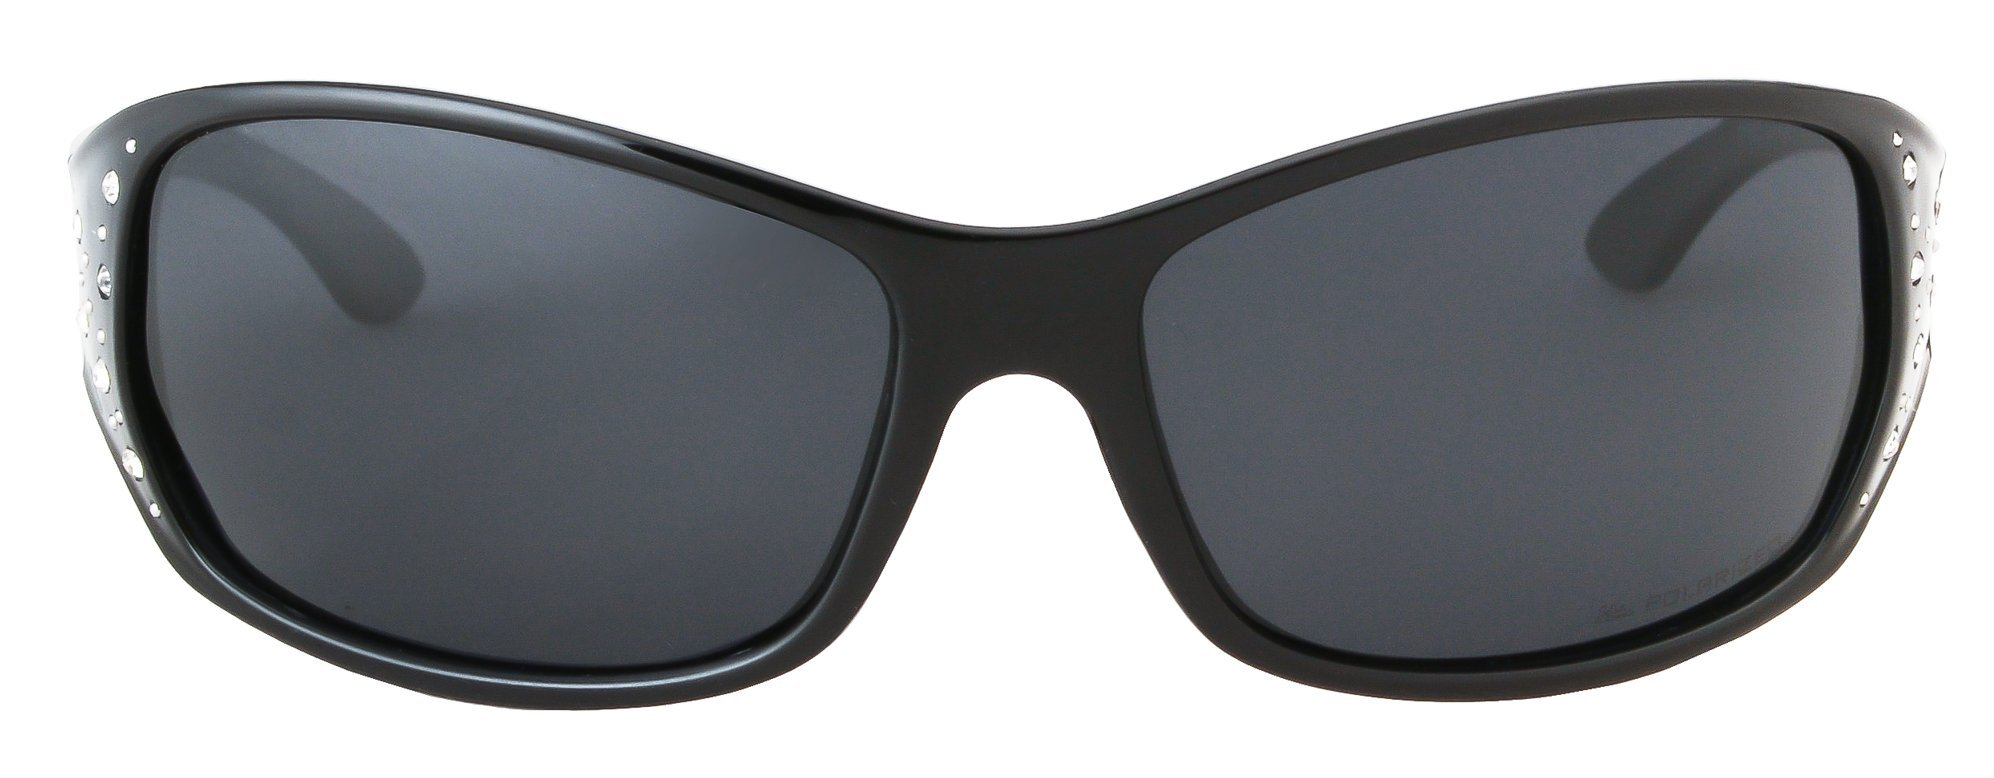 HZ Series Elettra Women's Premium Polarized Sunglasses by Hornz Midnight Black Frame Dark Smoke Lens